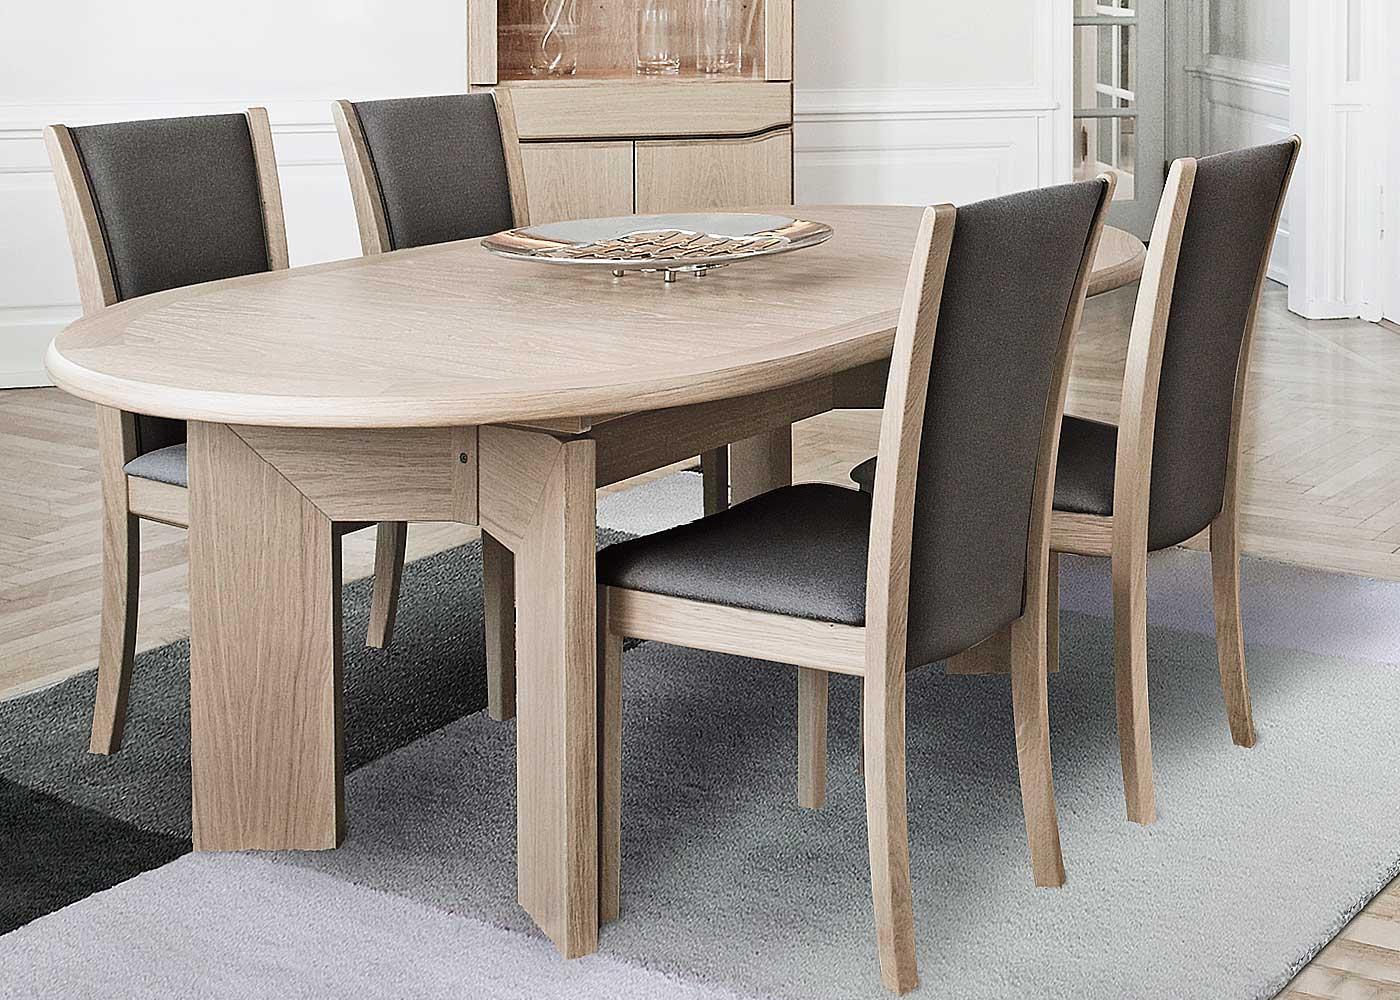 Skovby sm14 Dining Table  Midfurn Furniture Superstore